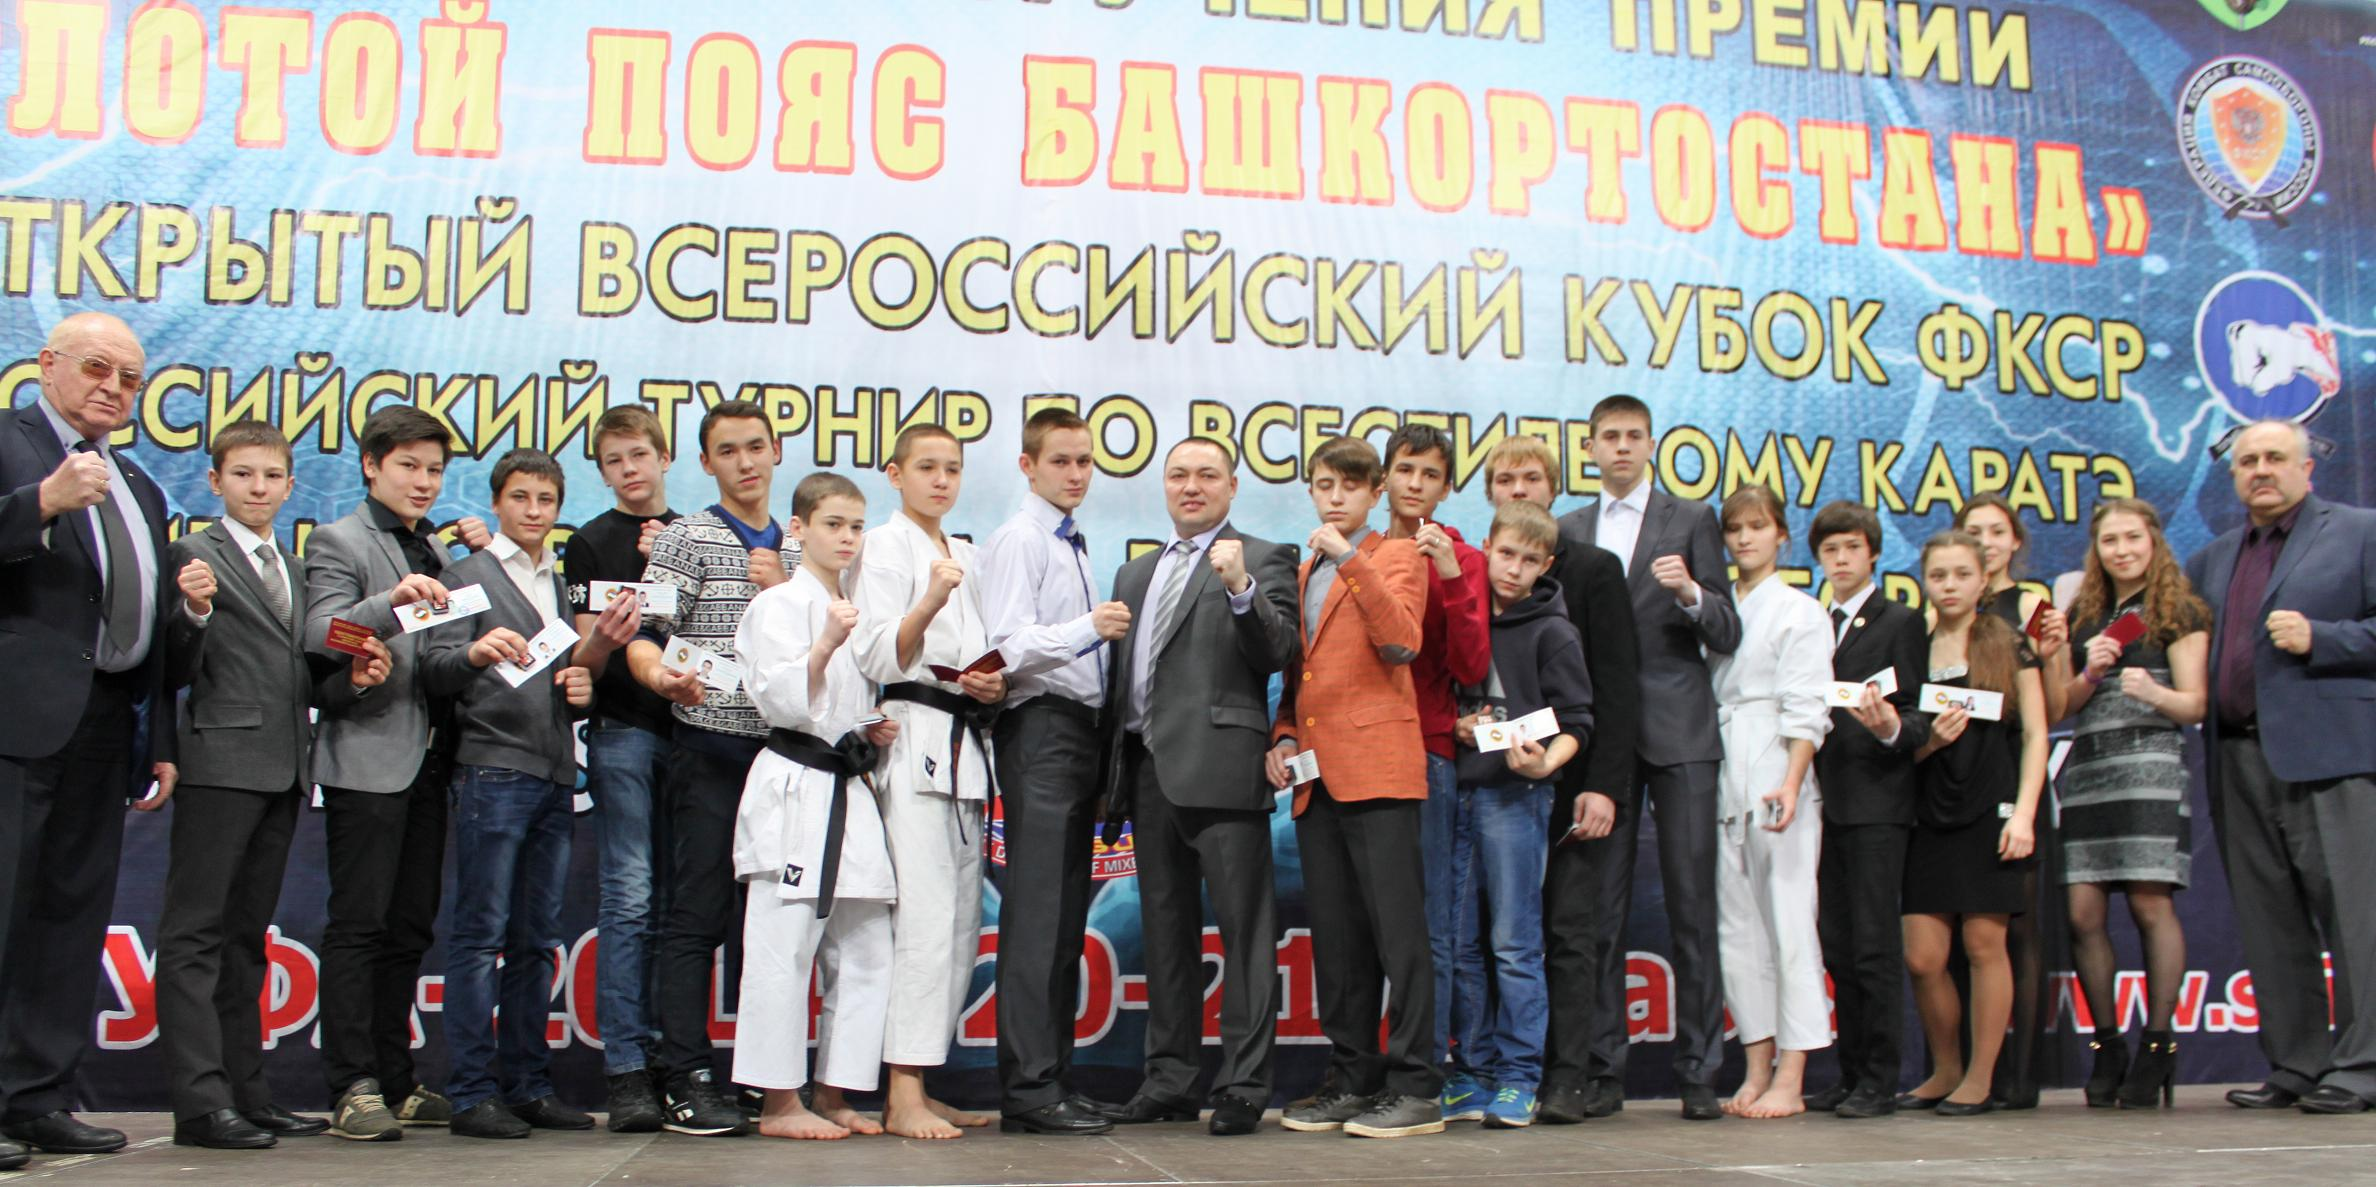 http://sbirb.combatsd.ru/images/upload/IMG_9471.JPG